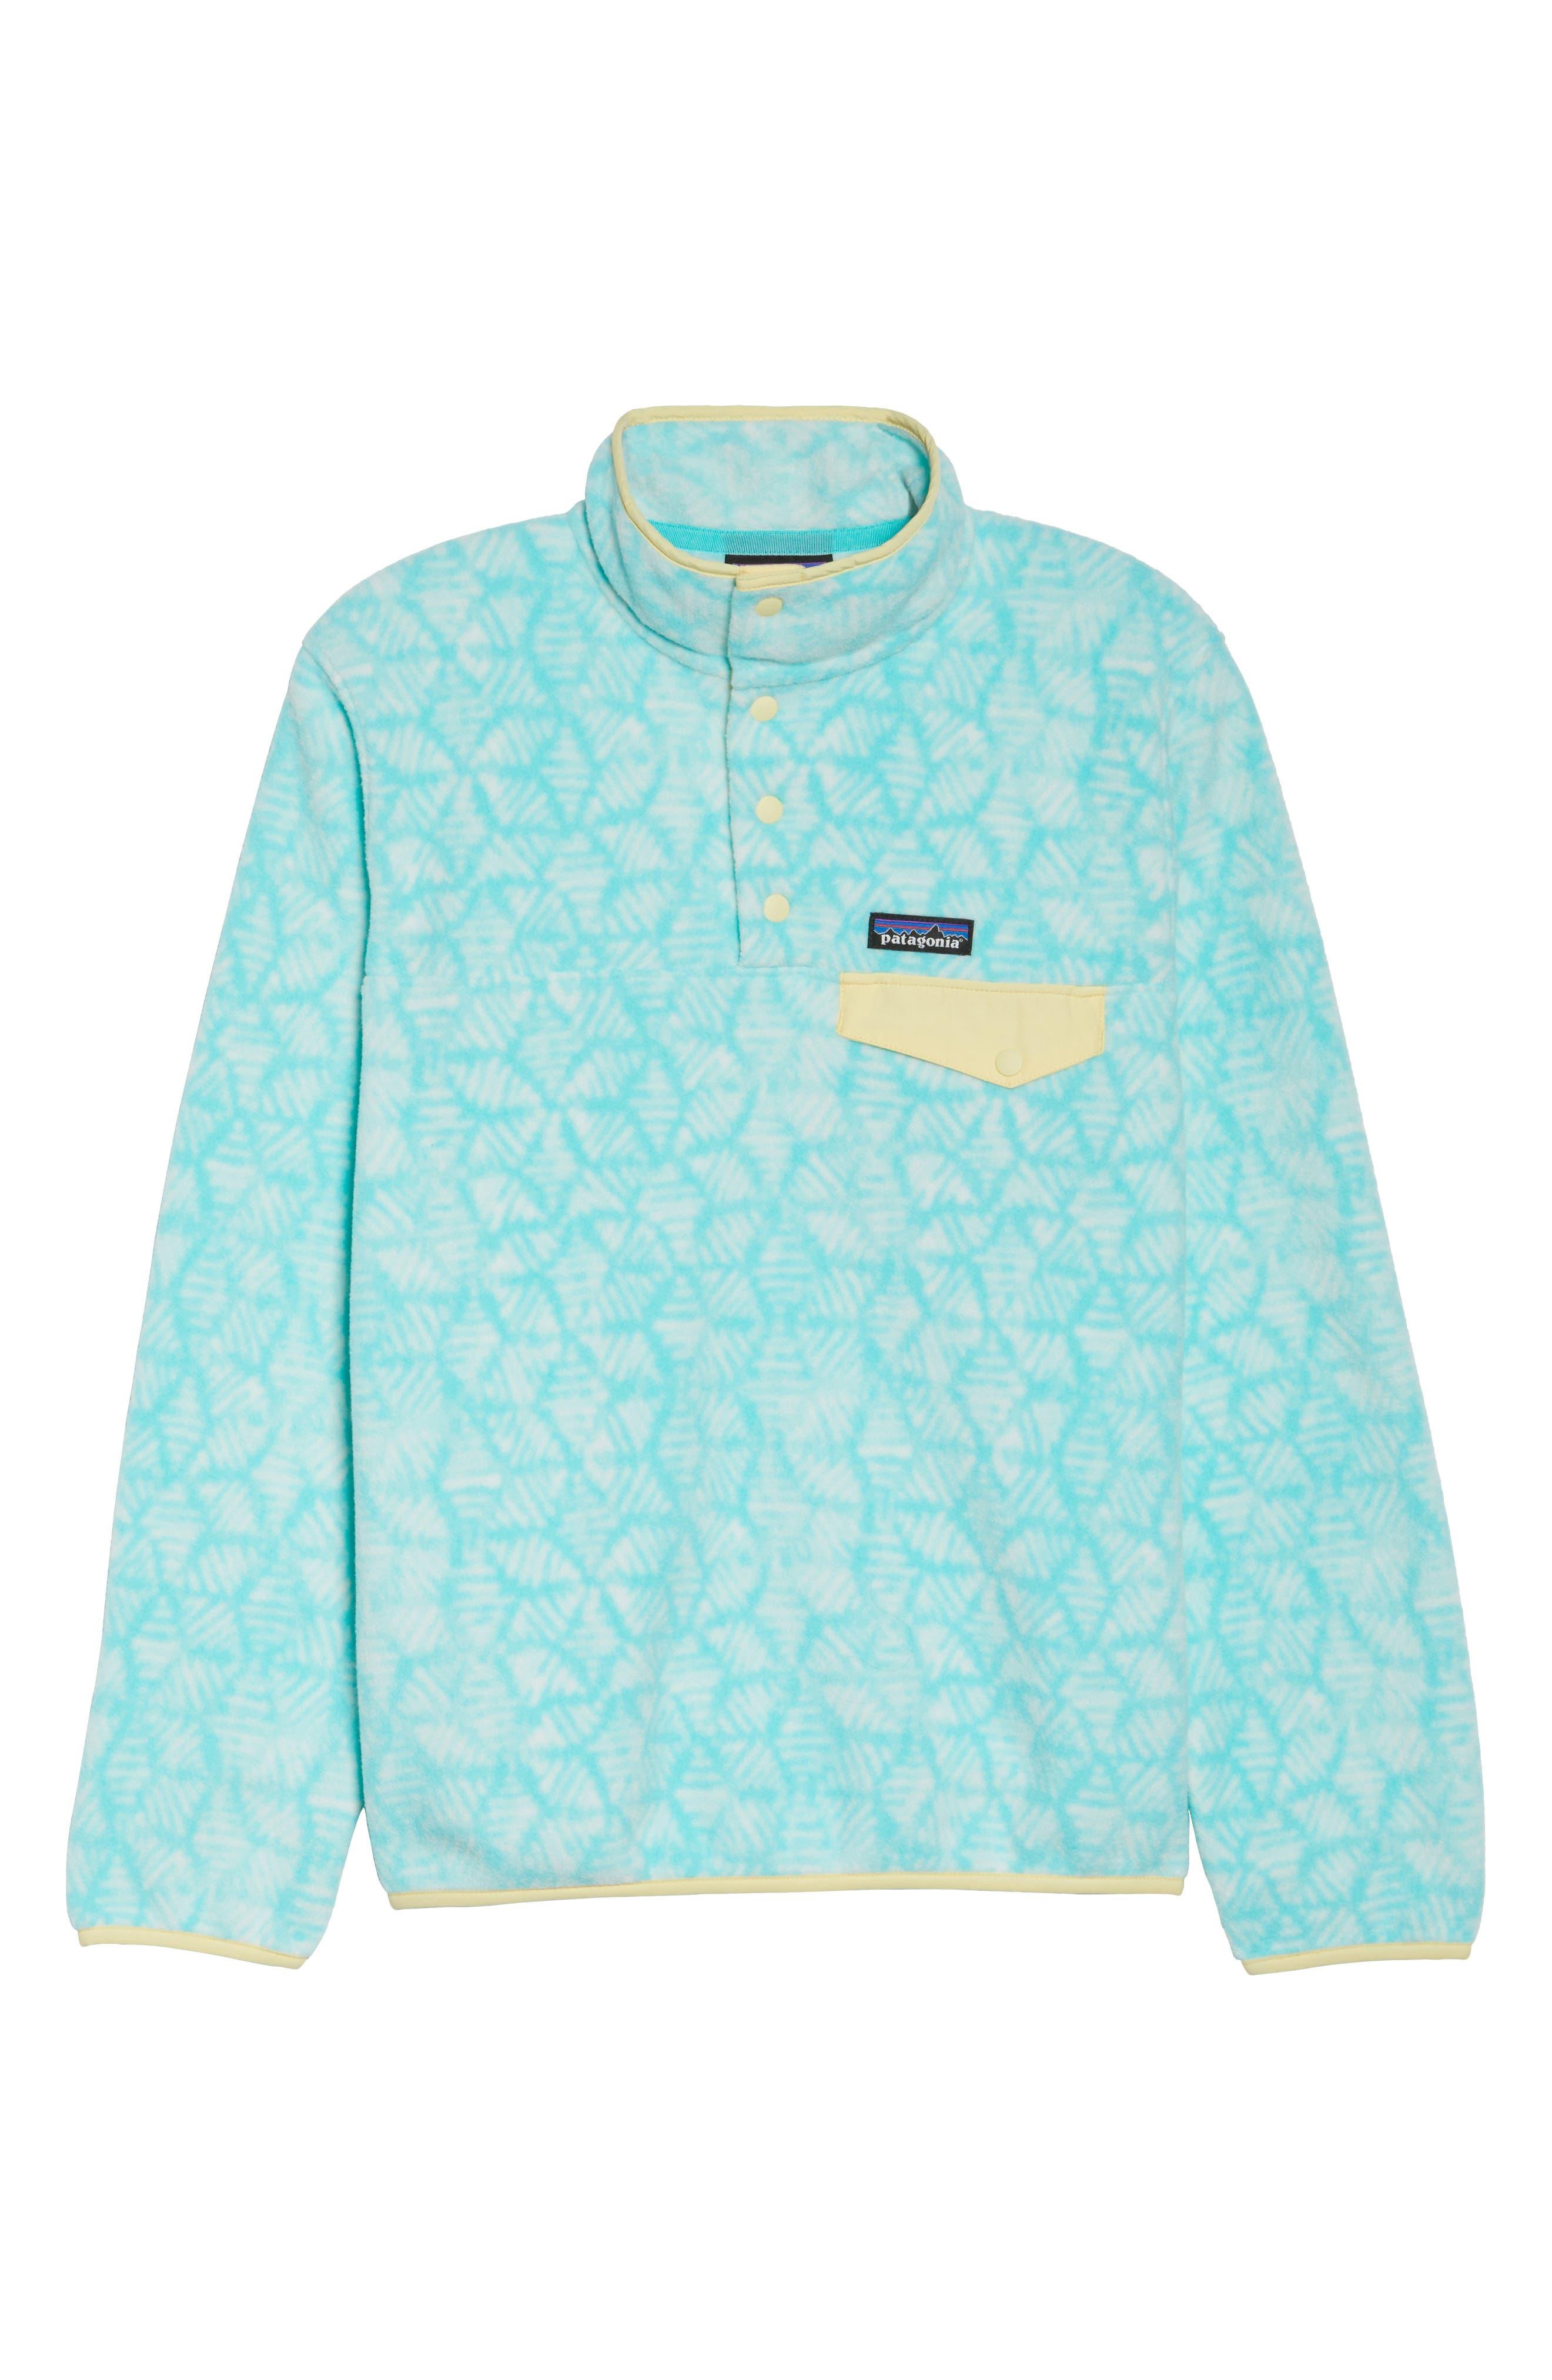 Synchilla Snap-T<sup>®</sup> Fleece Pullover,                             Alternate thumbnail 7, color,                             Batik Hex Big/ Bend Blue